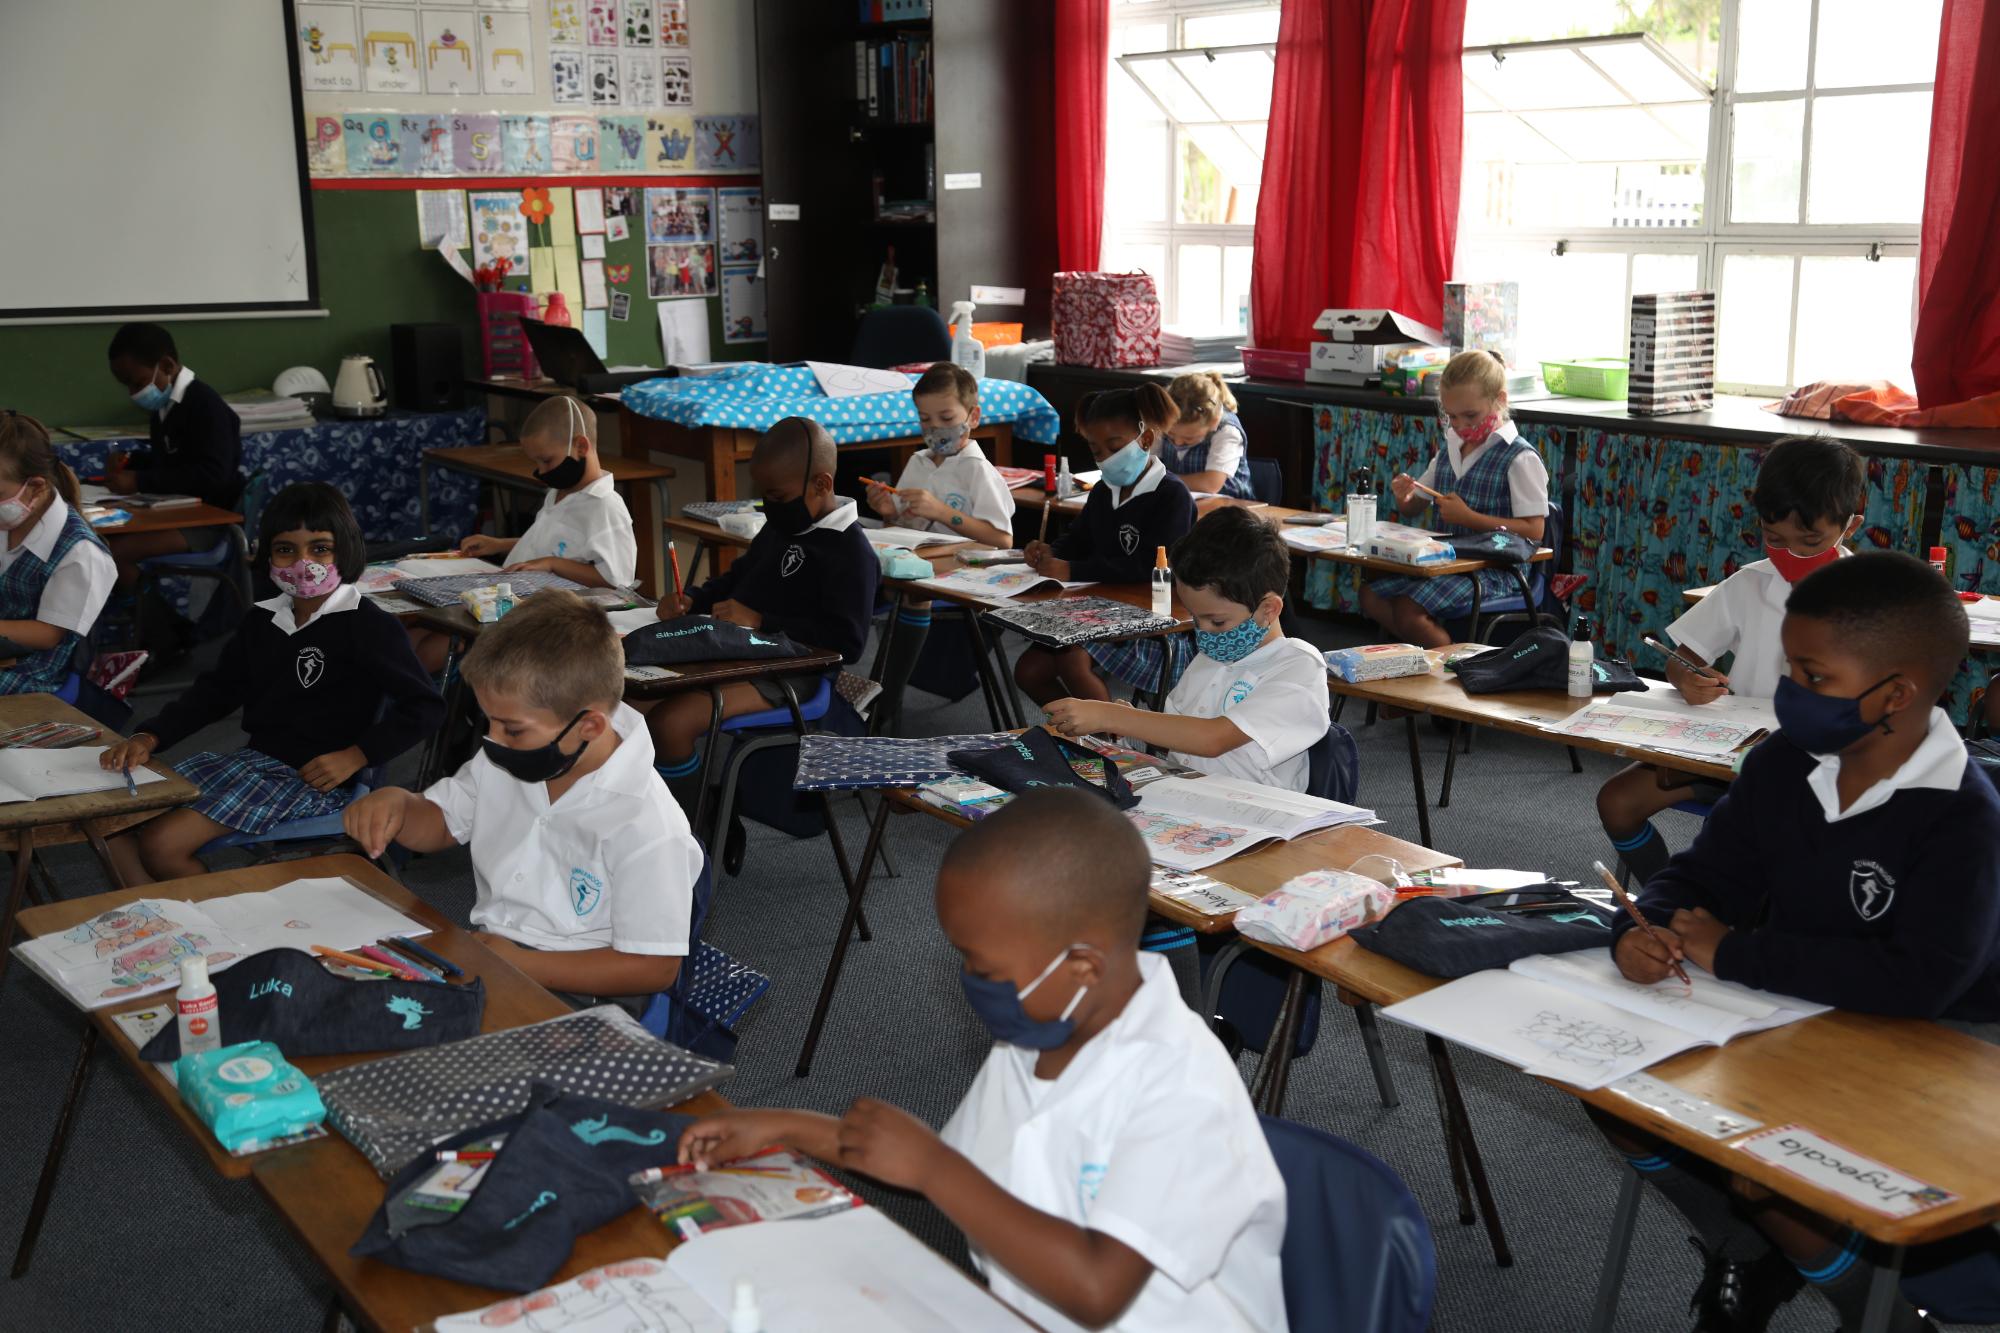 grade_01_first_schoolday_001